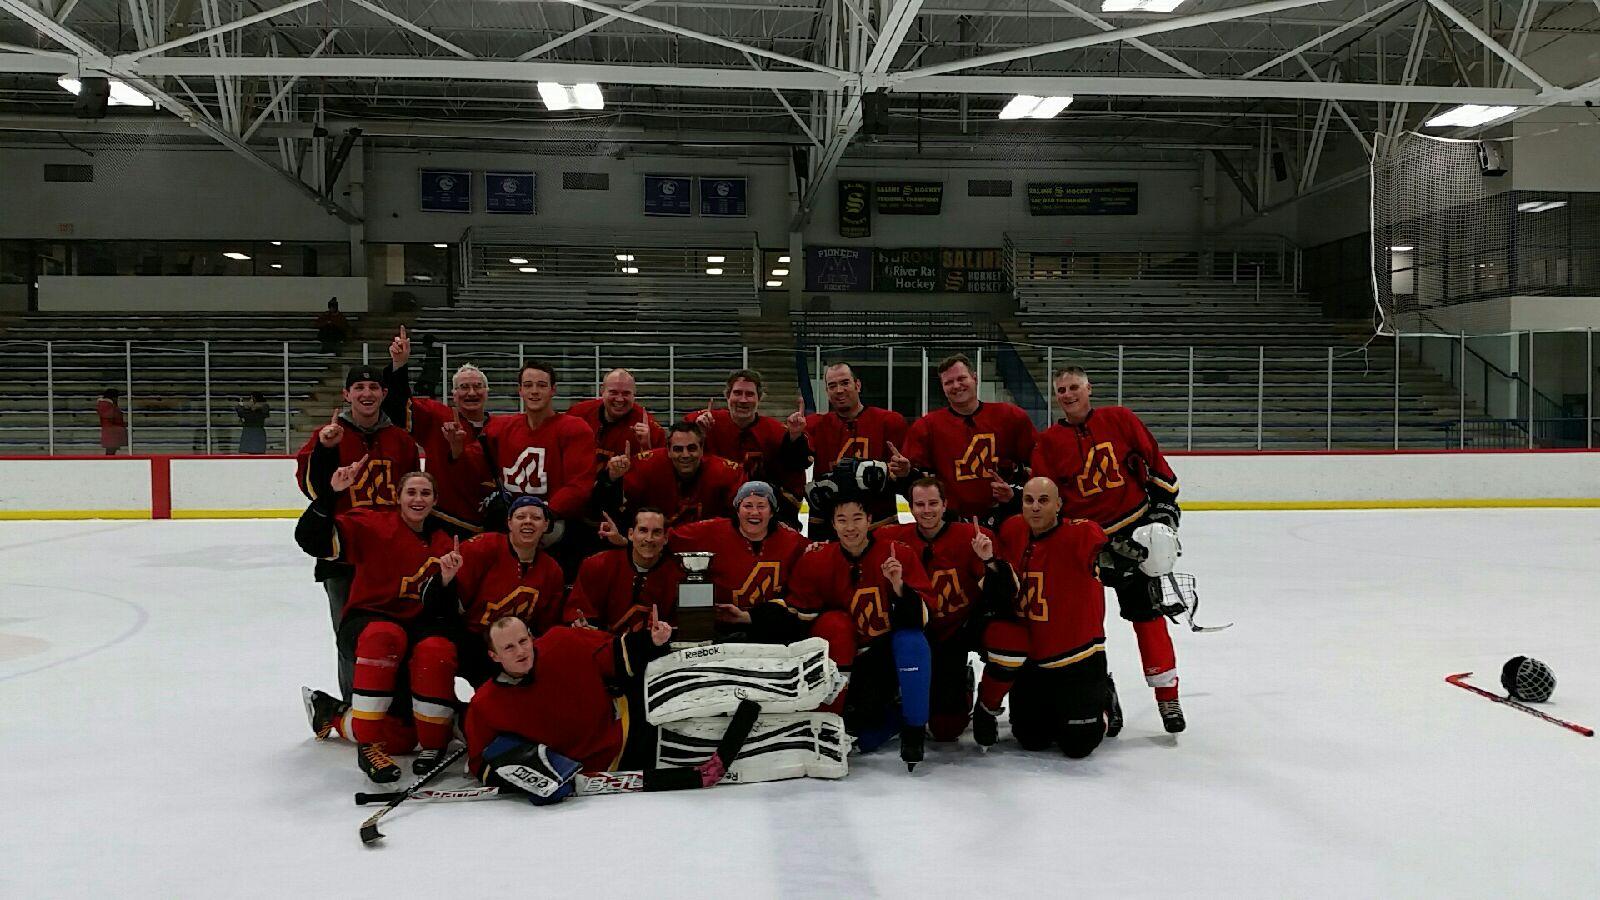 Aventinus wins its first championship!